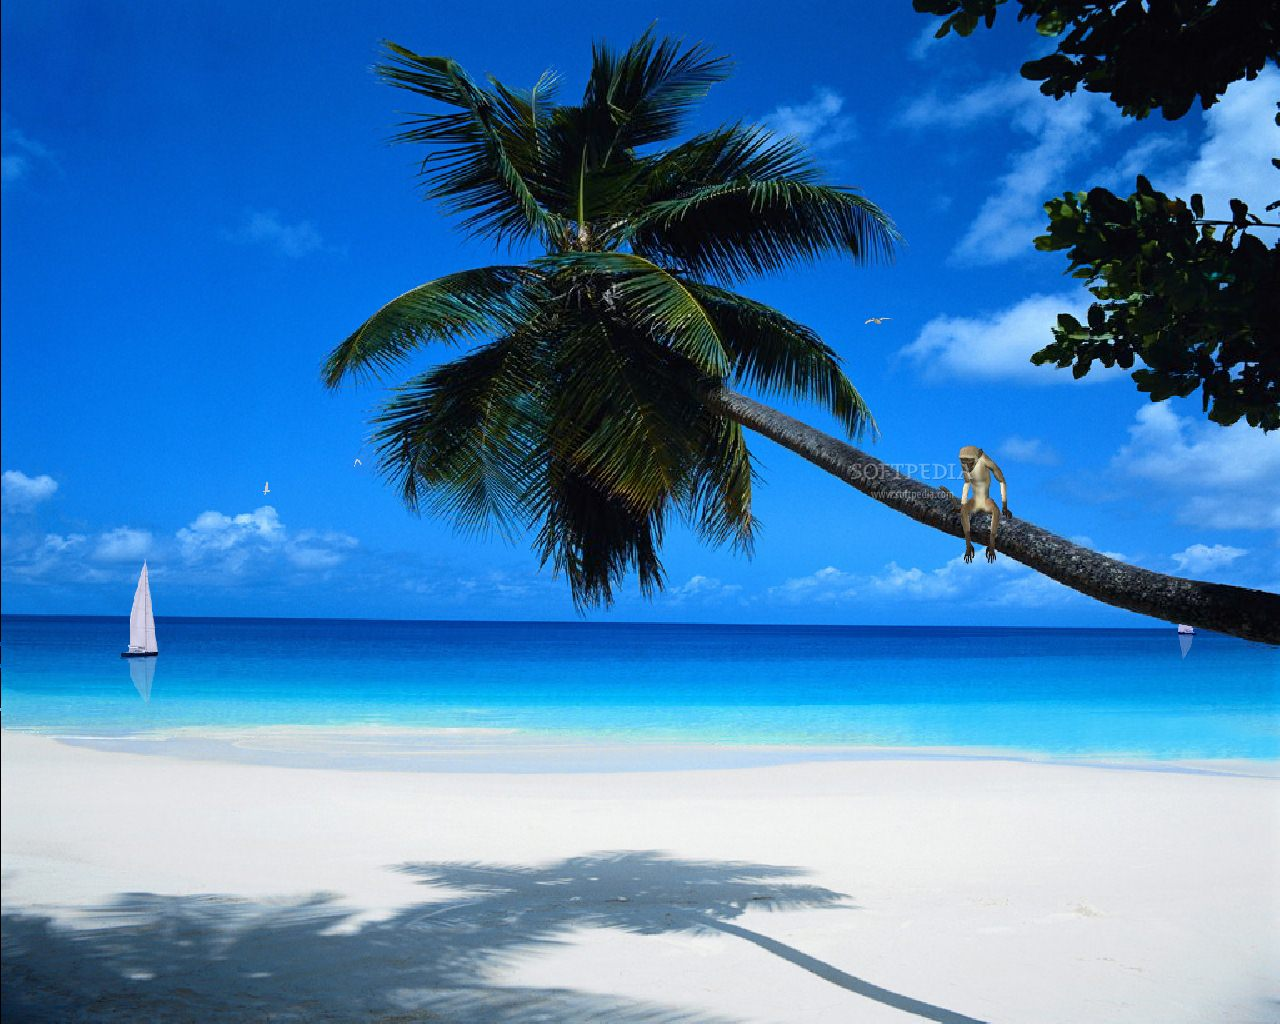 Tropic Paradise   Animated Screensaver Screenshots 1280x1024